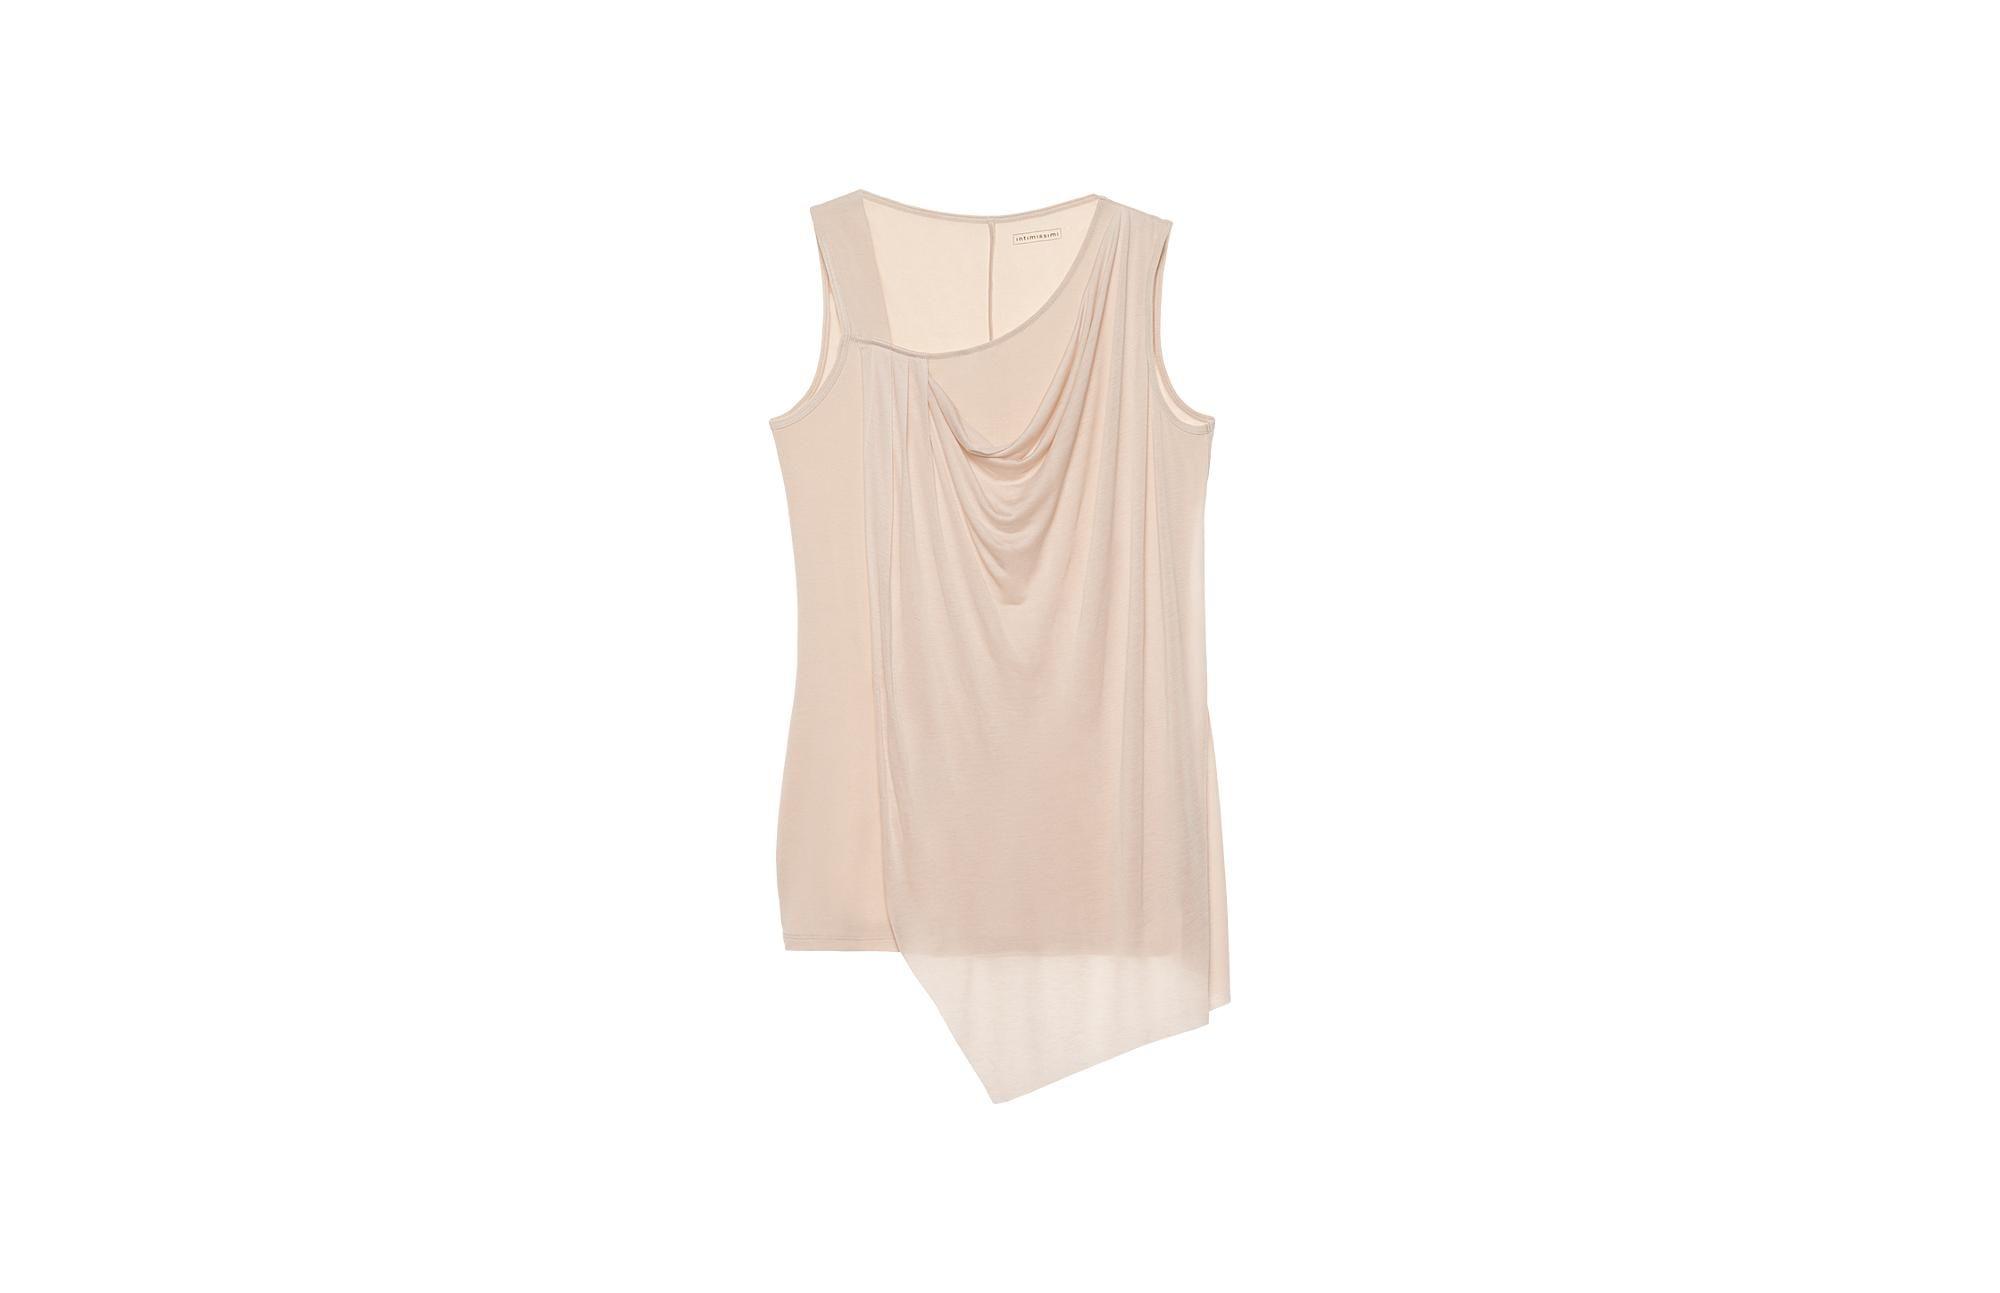 38e42f1adba Camiseta de Tirantes de Viscosa con Drapeado - Intimissimi   Fashion